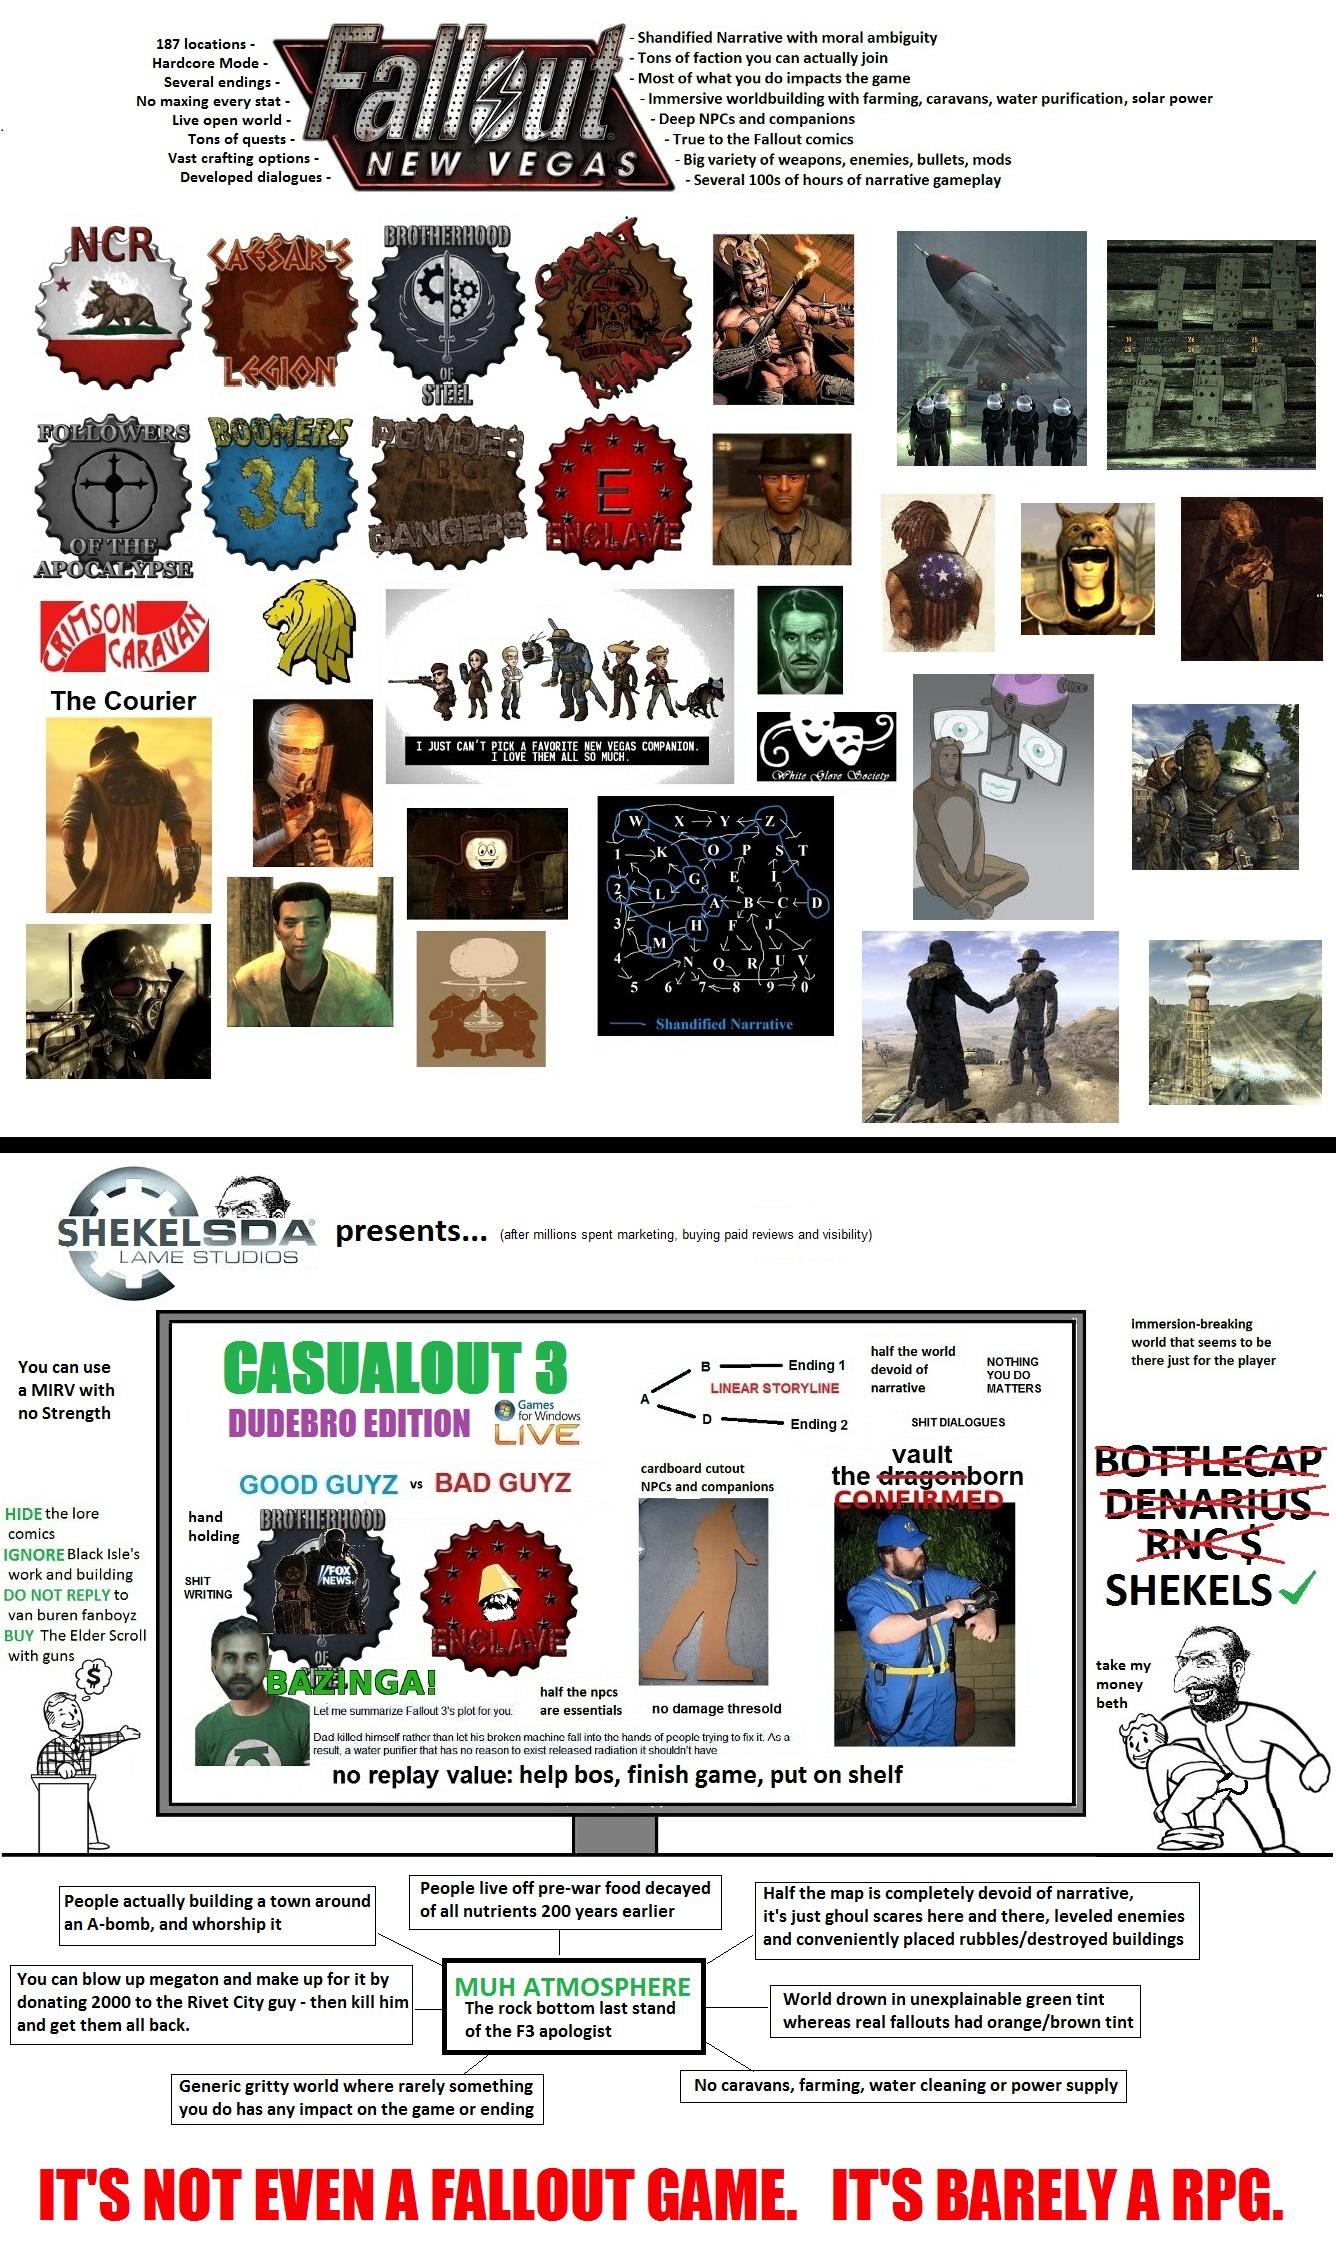 Bethesdadrones+never+learn+_088663b0dc03fce1db60bbfa8c1b1639.jpg